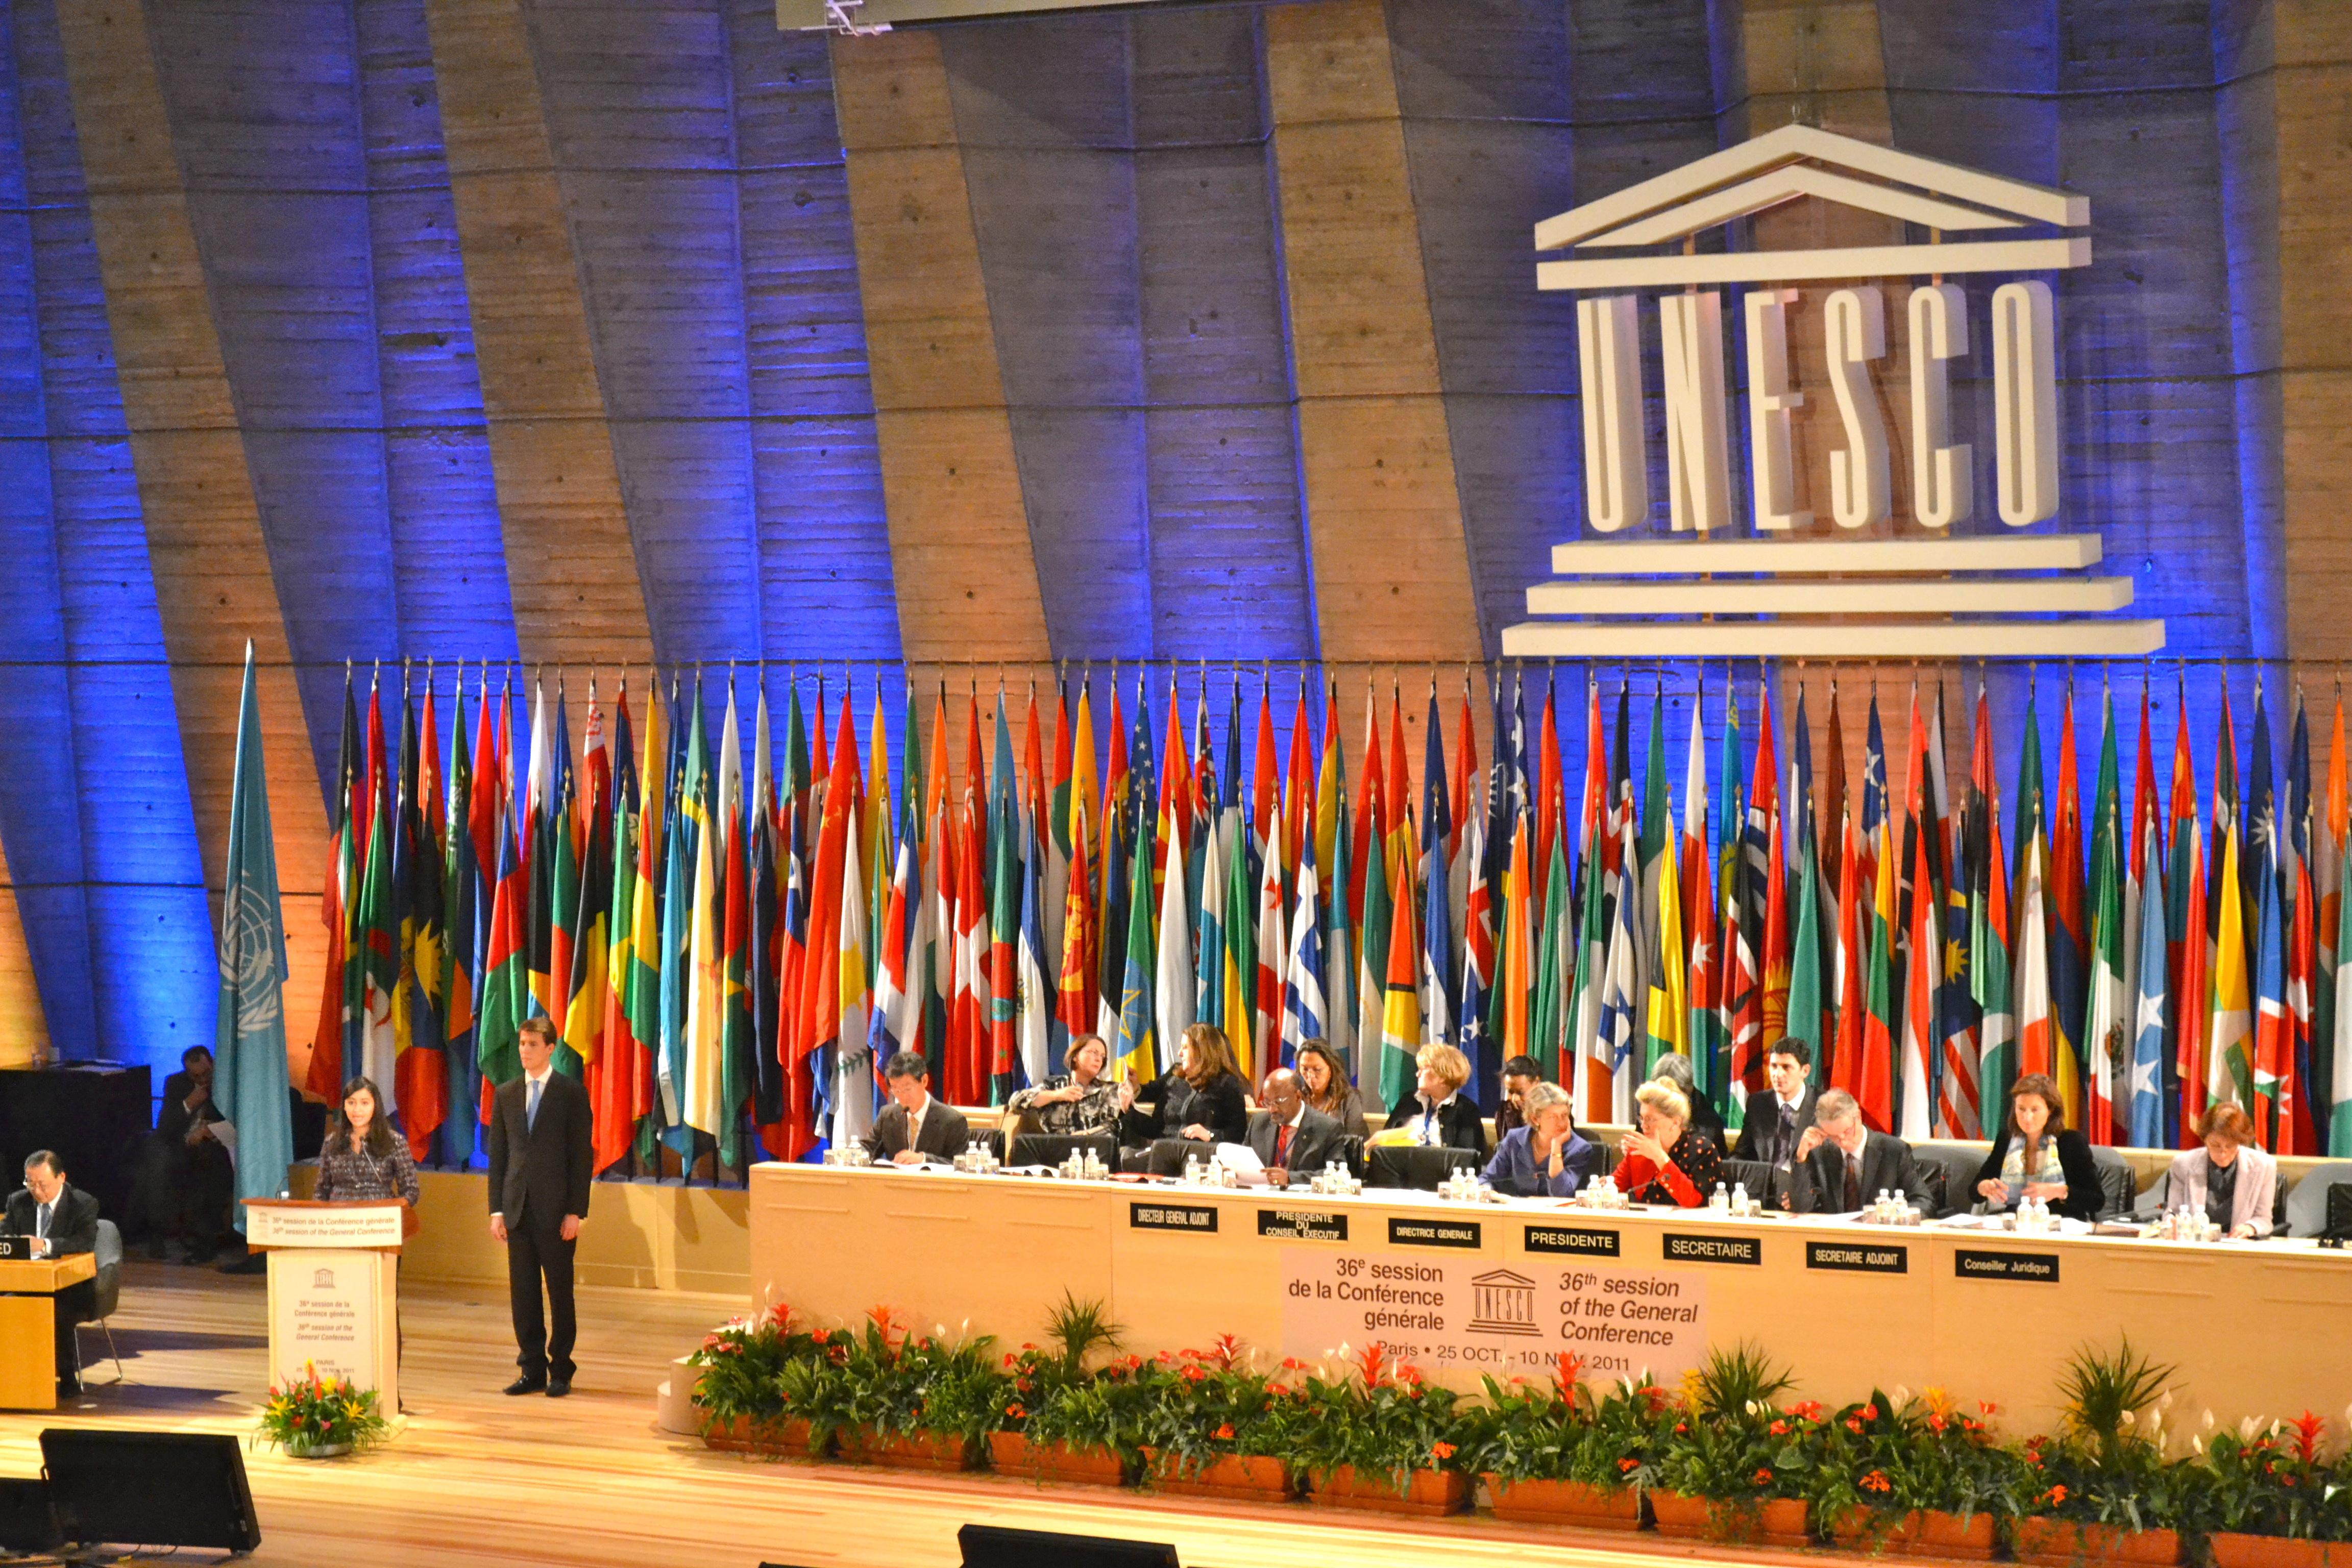 UNESCO Headquarters, Paris, France, on October 31, 2011.